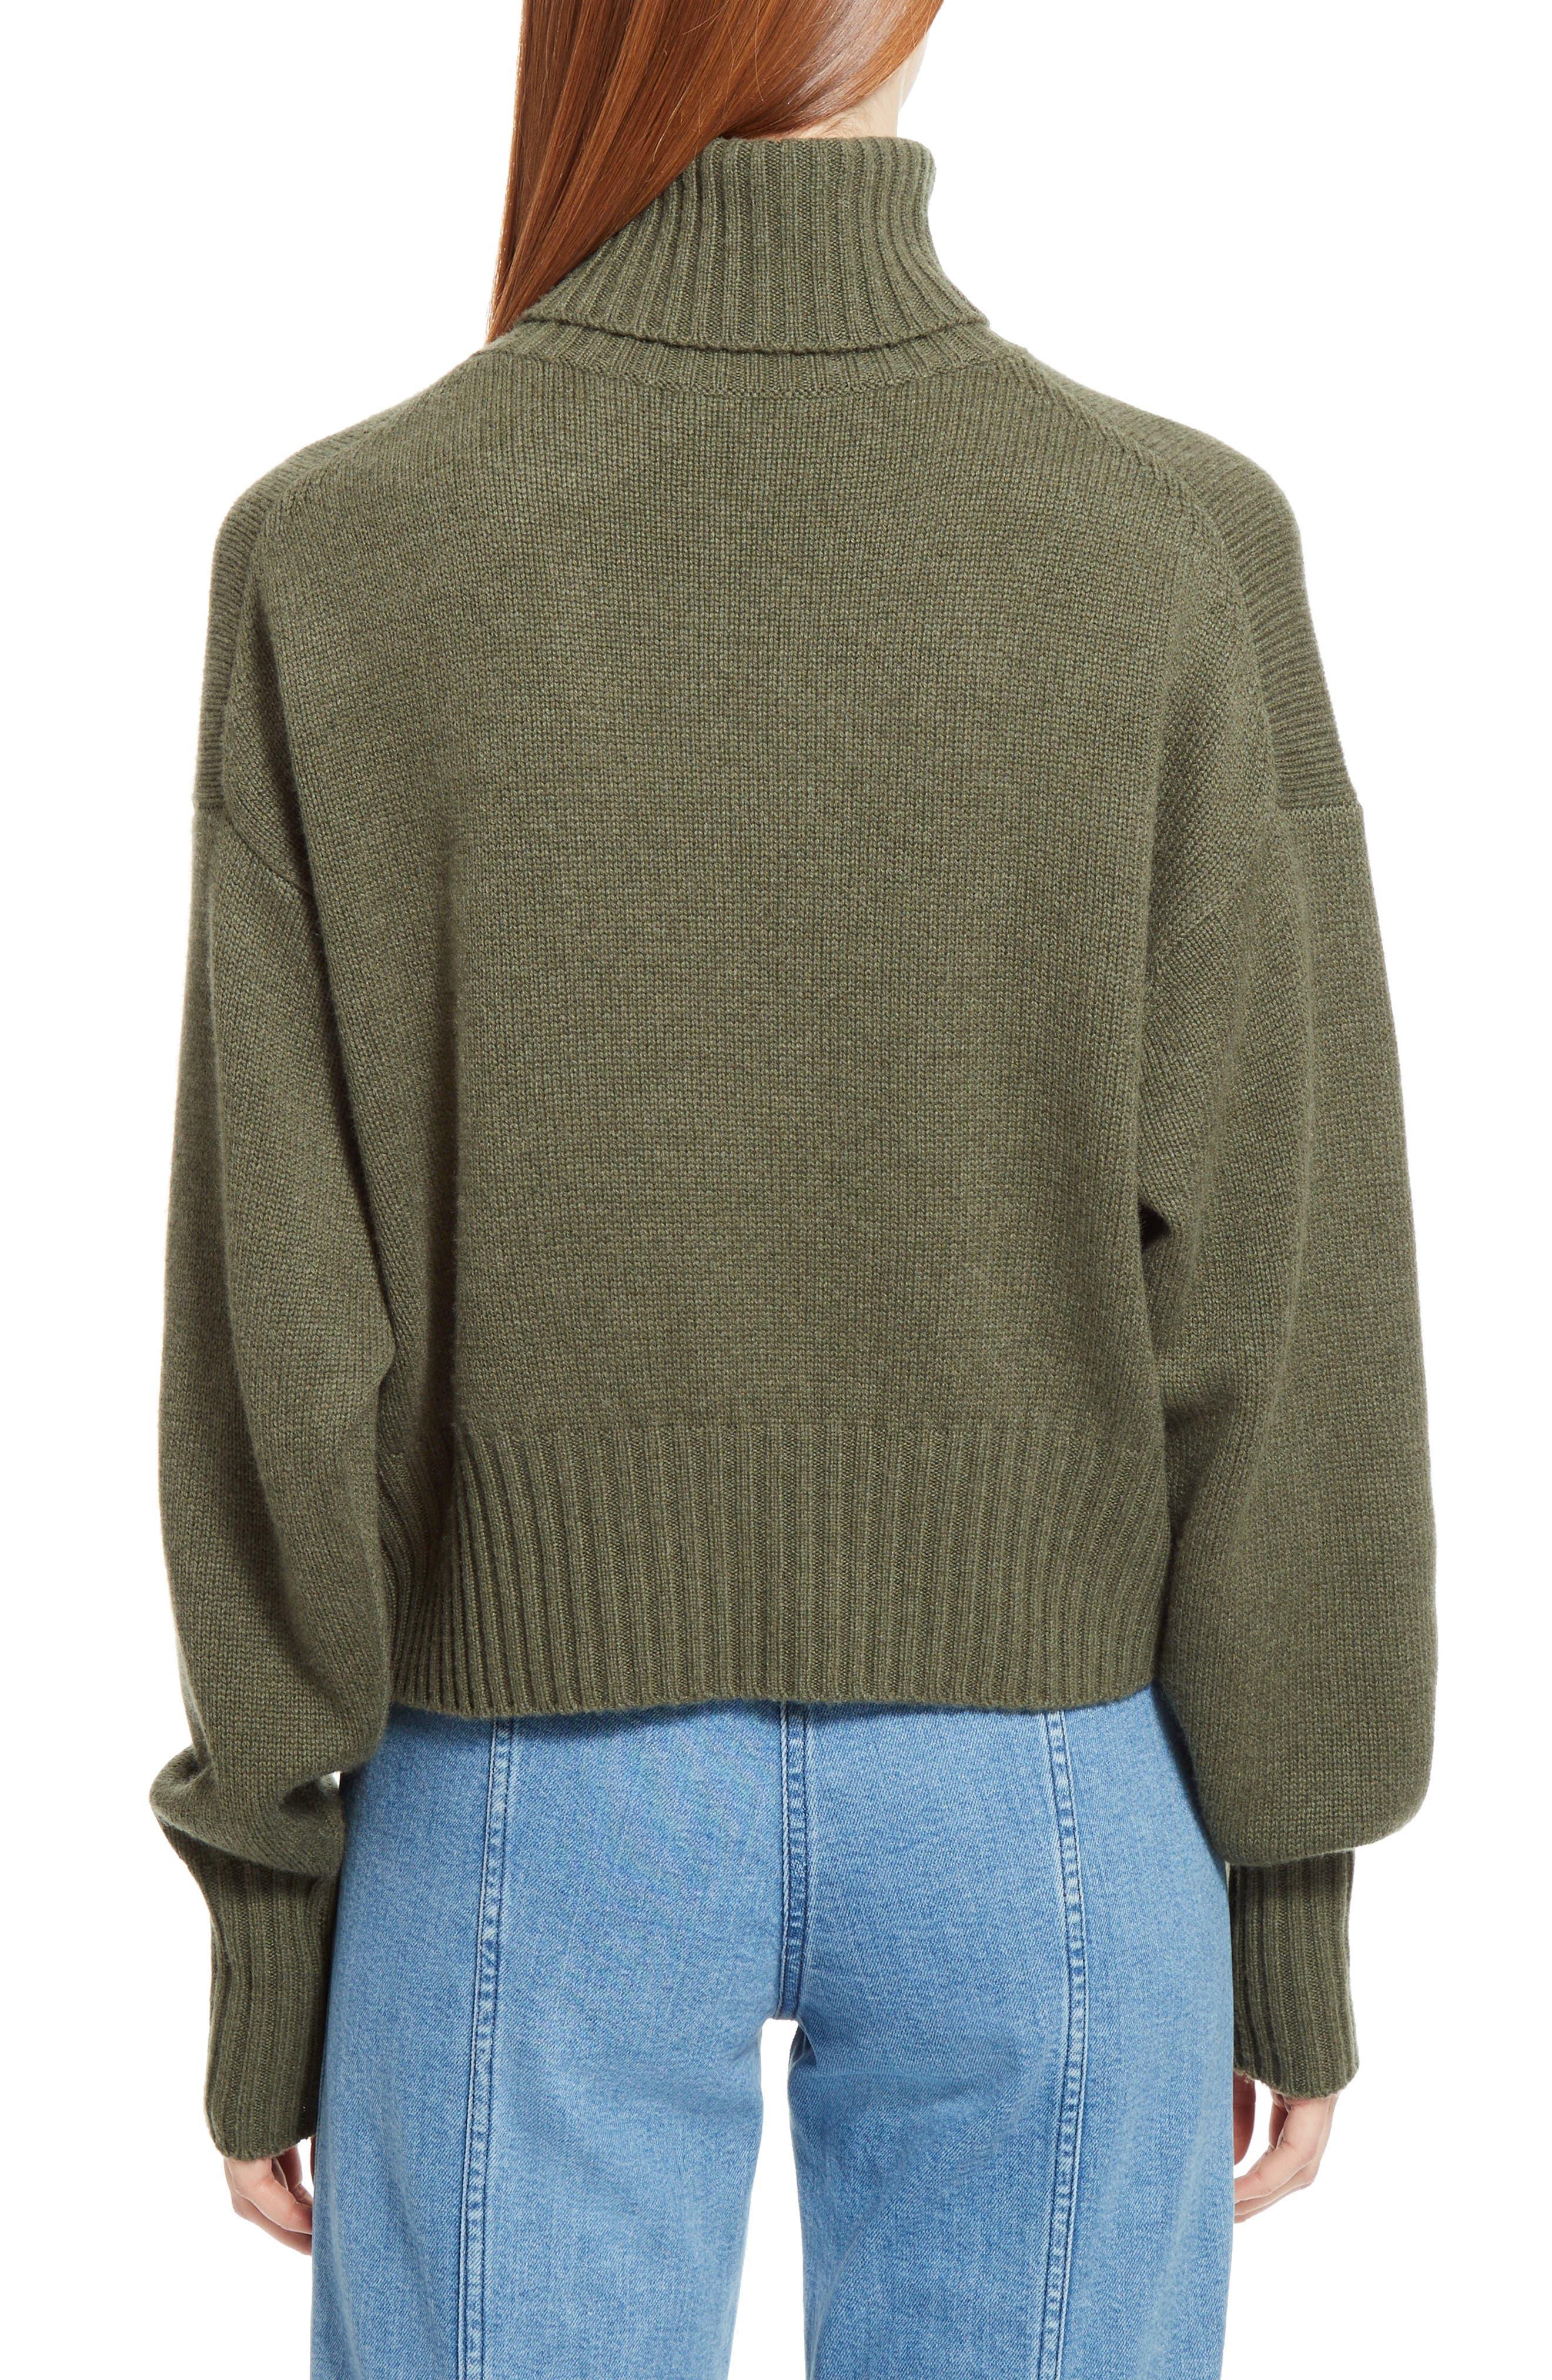 Iconic Cashmere Turtlenck Sweater,                             Alternate thumbnail 2, color,                             301